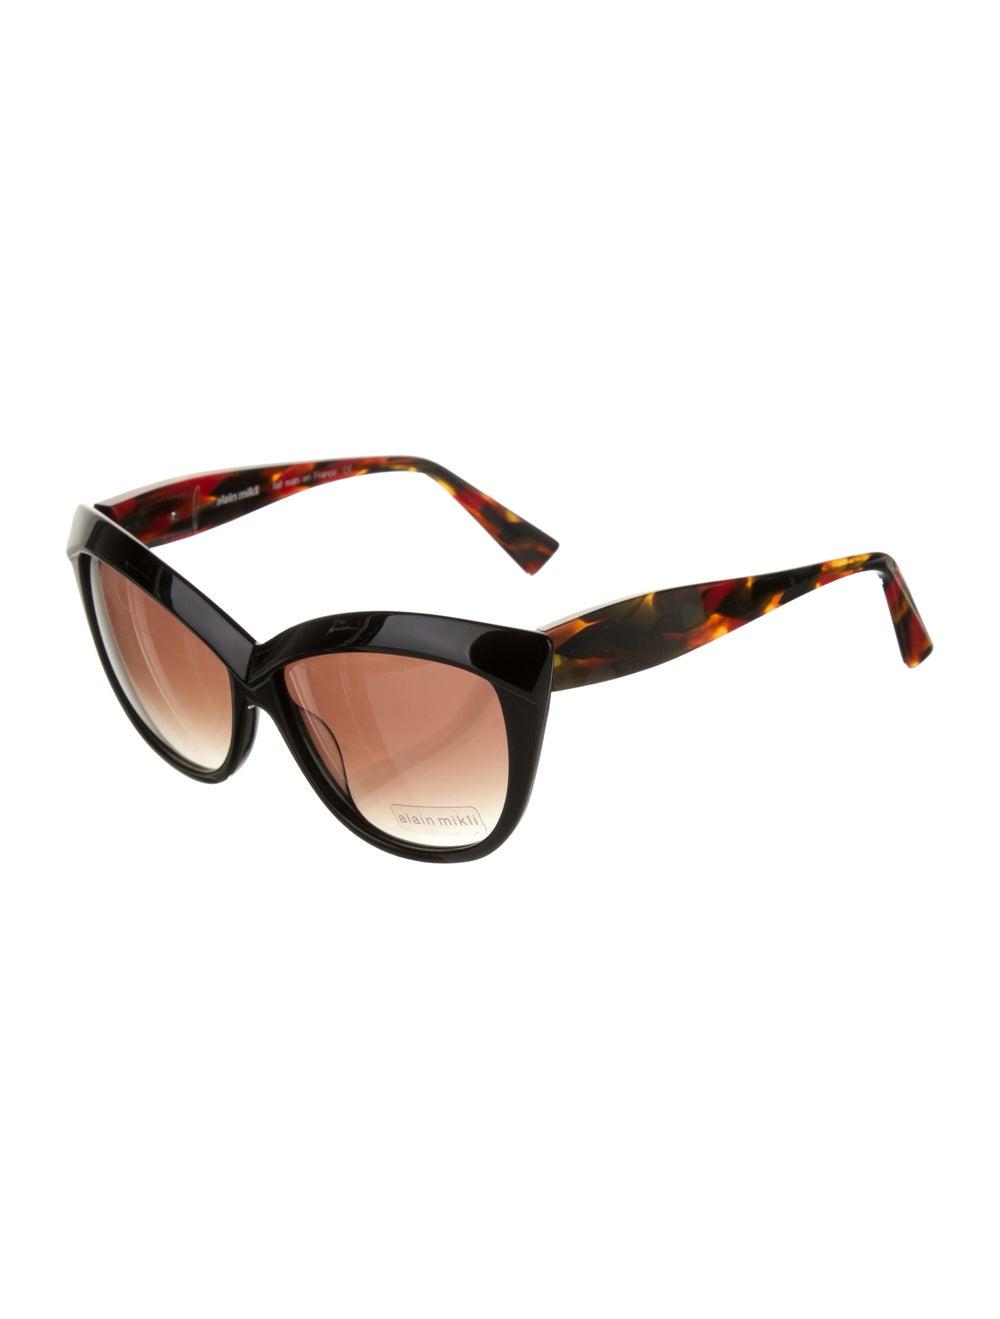 Alain Mikli Cat-Eye Tinted Sunglasses Black - image 2